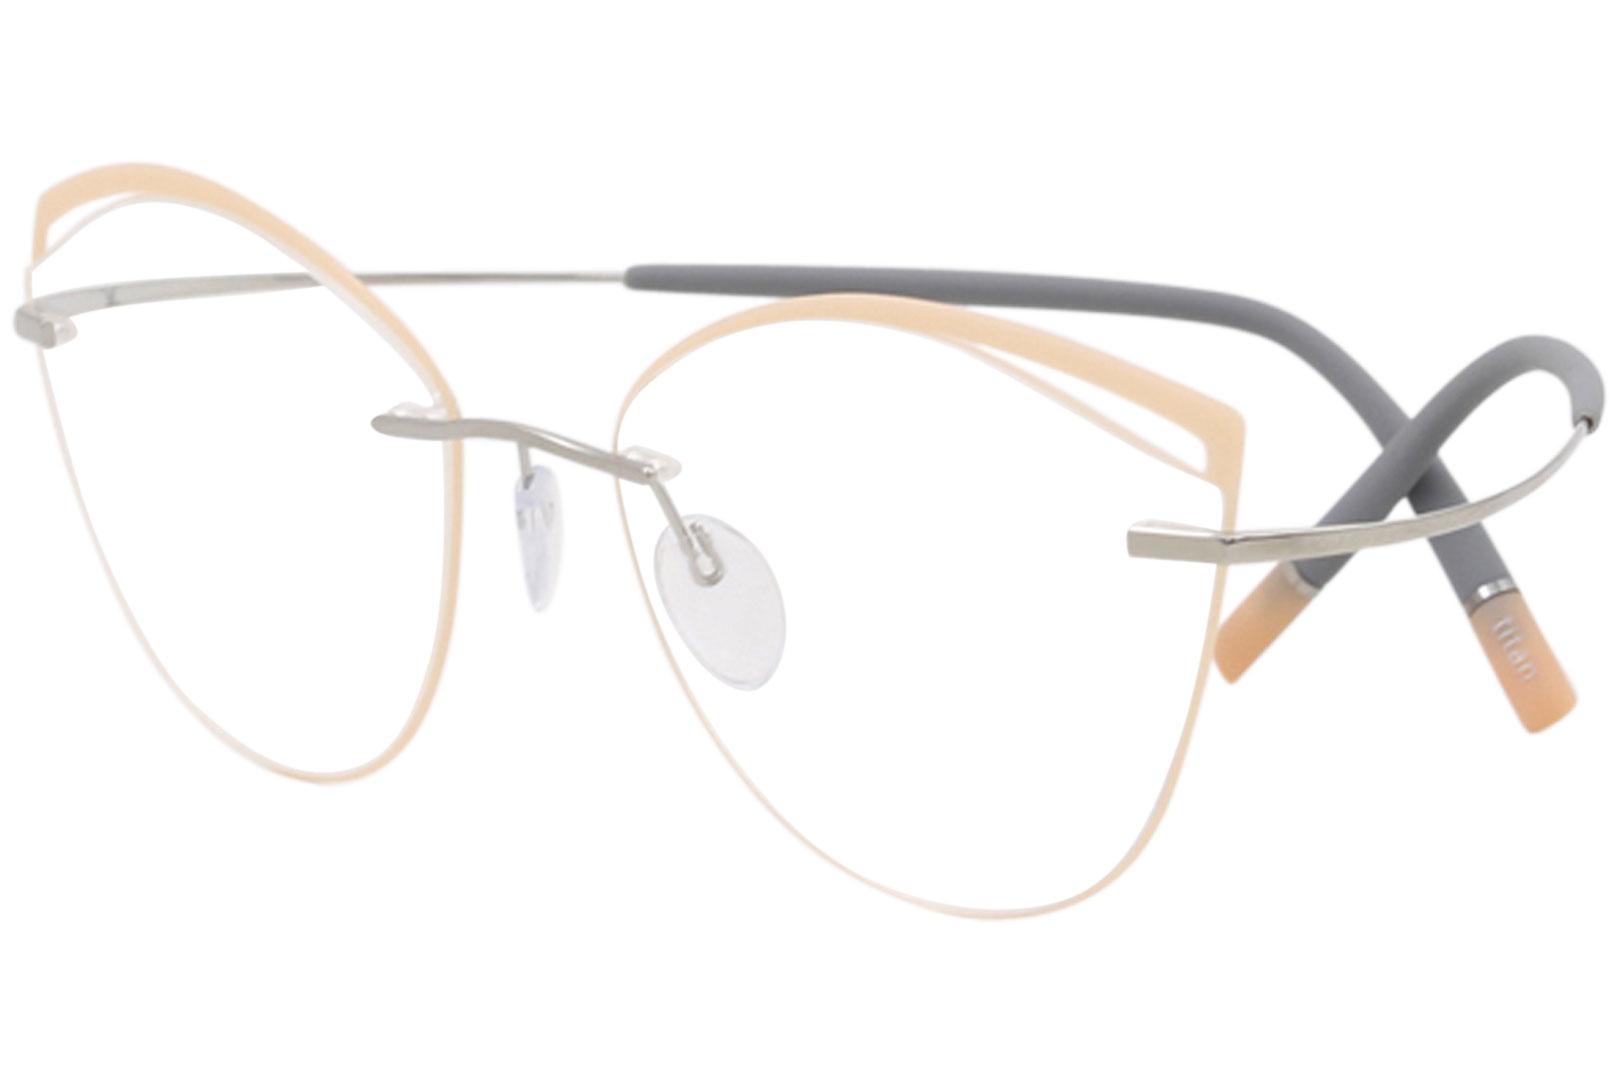 310dd561ec1 Silhouette Eyeglasses Titan Minimal Art Icon Accent Rings FU 5518 ...